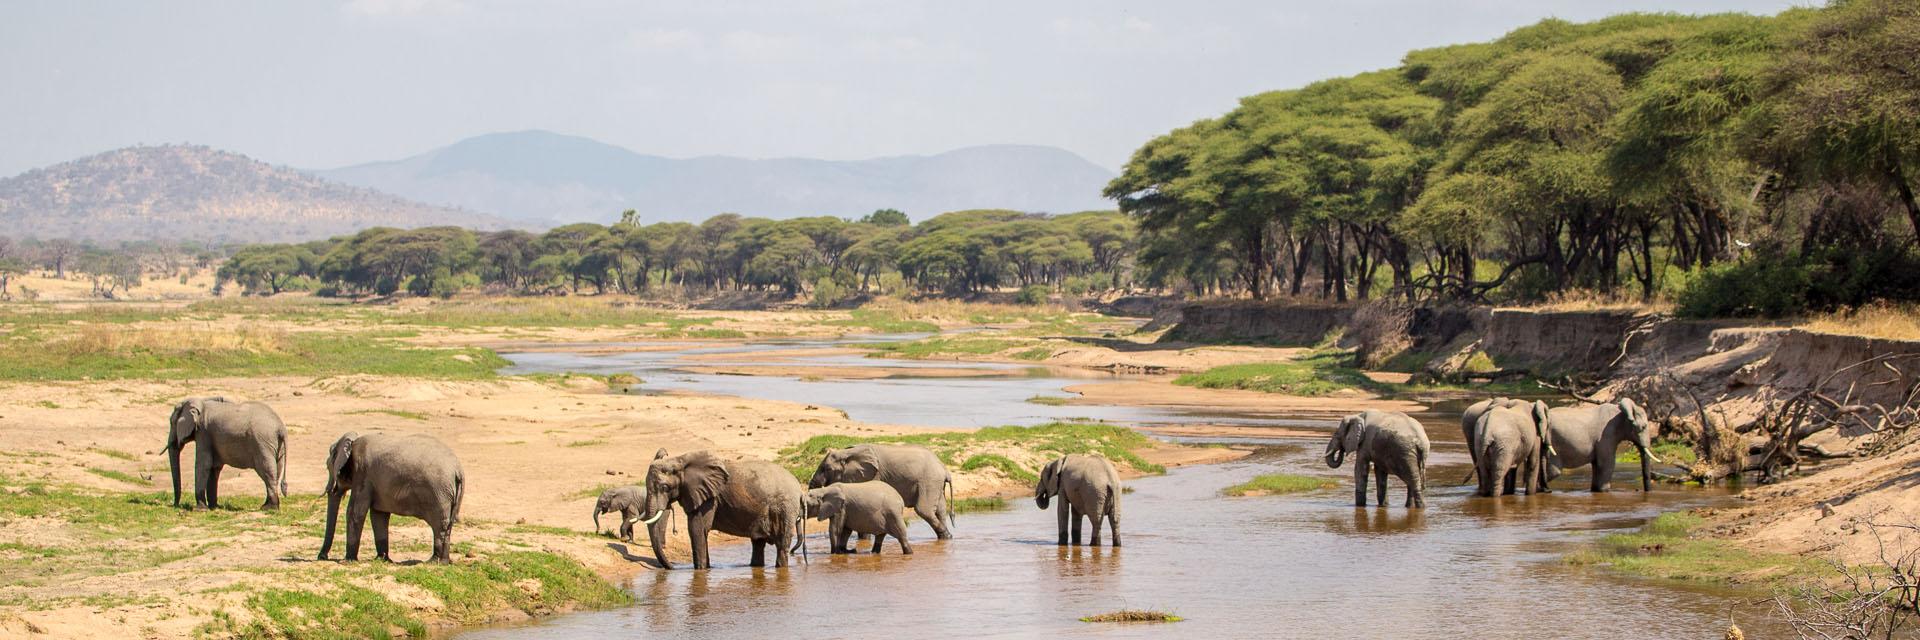 Elephants in Ruaha